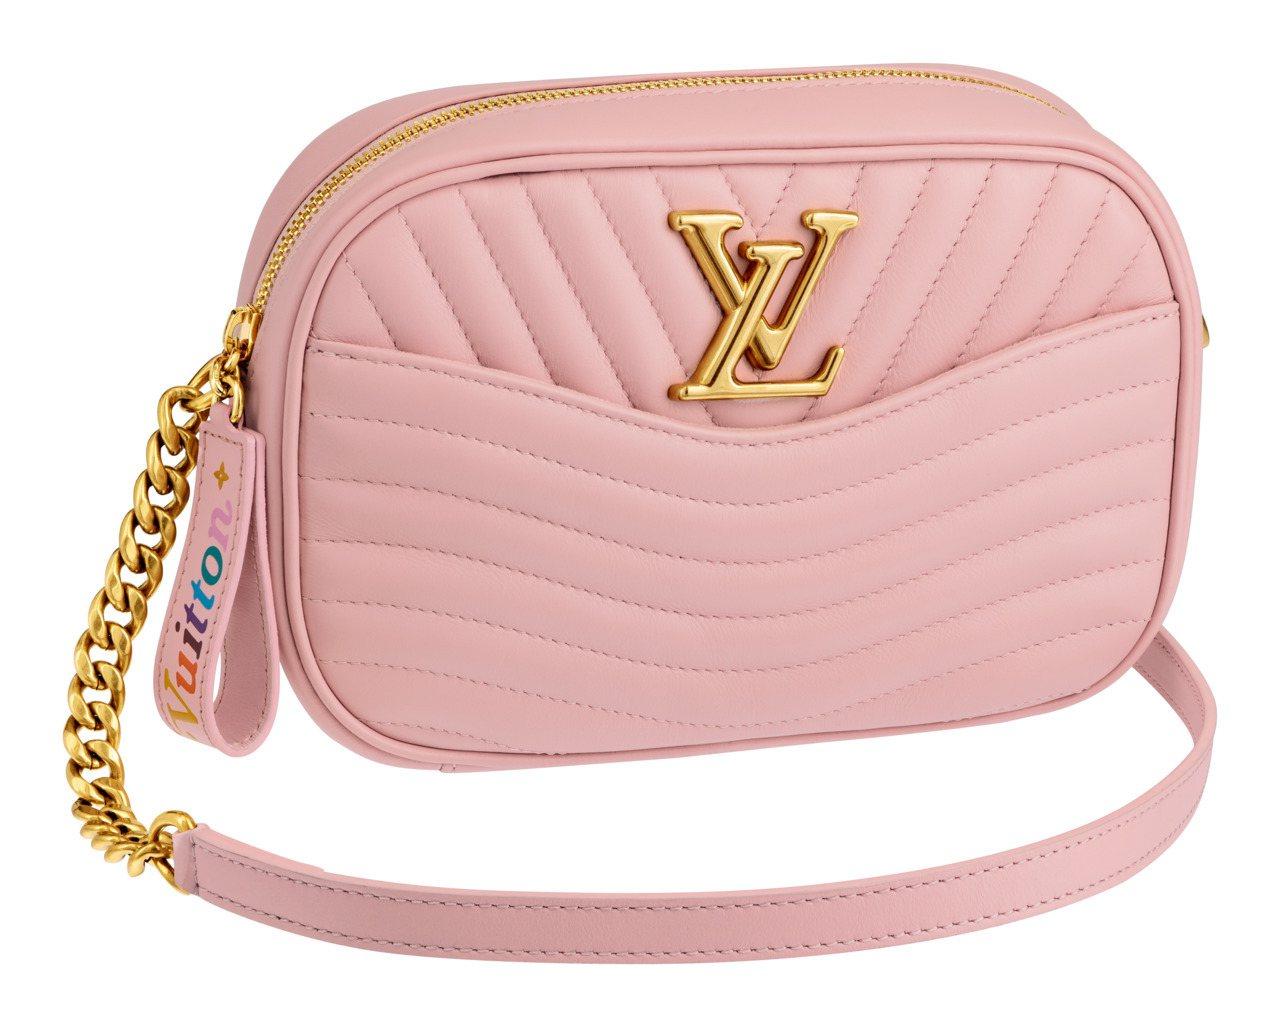 New Wave糖果粉紅色相機袋,售價61,500元。圖/LV提供